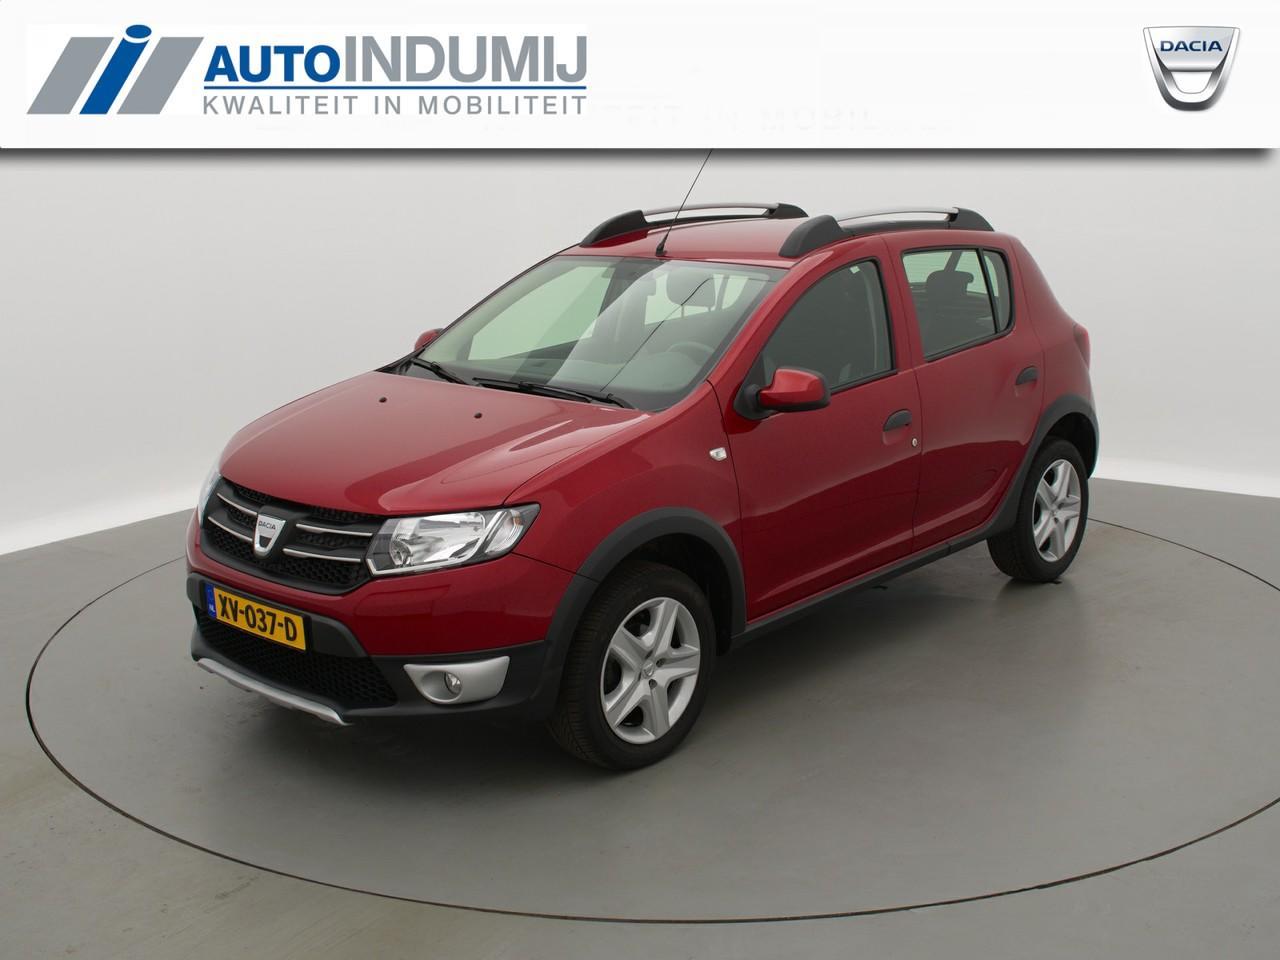 Dacia Sandero Tce 90 stepway lauréate / navigatie / parkeersensoren / airco